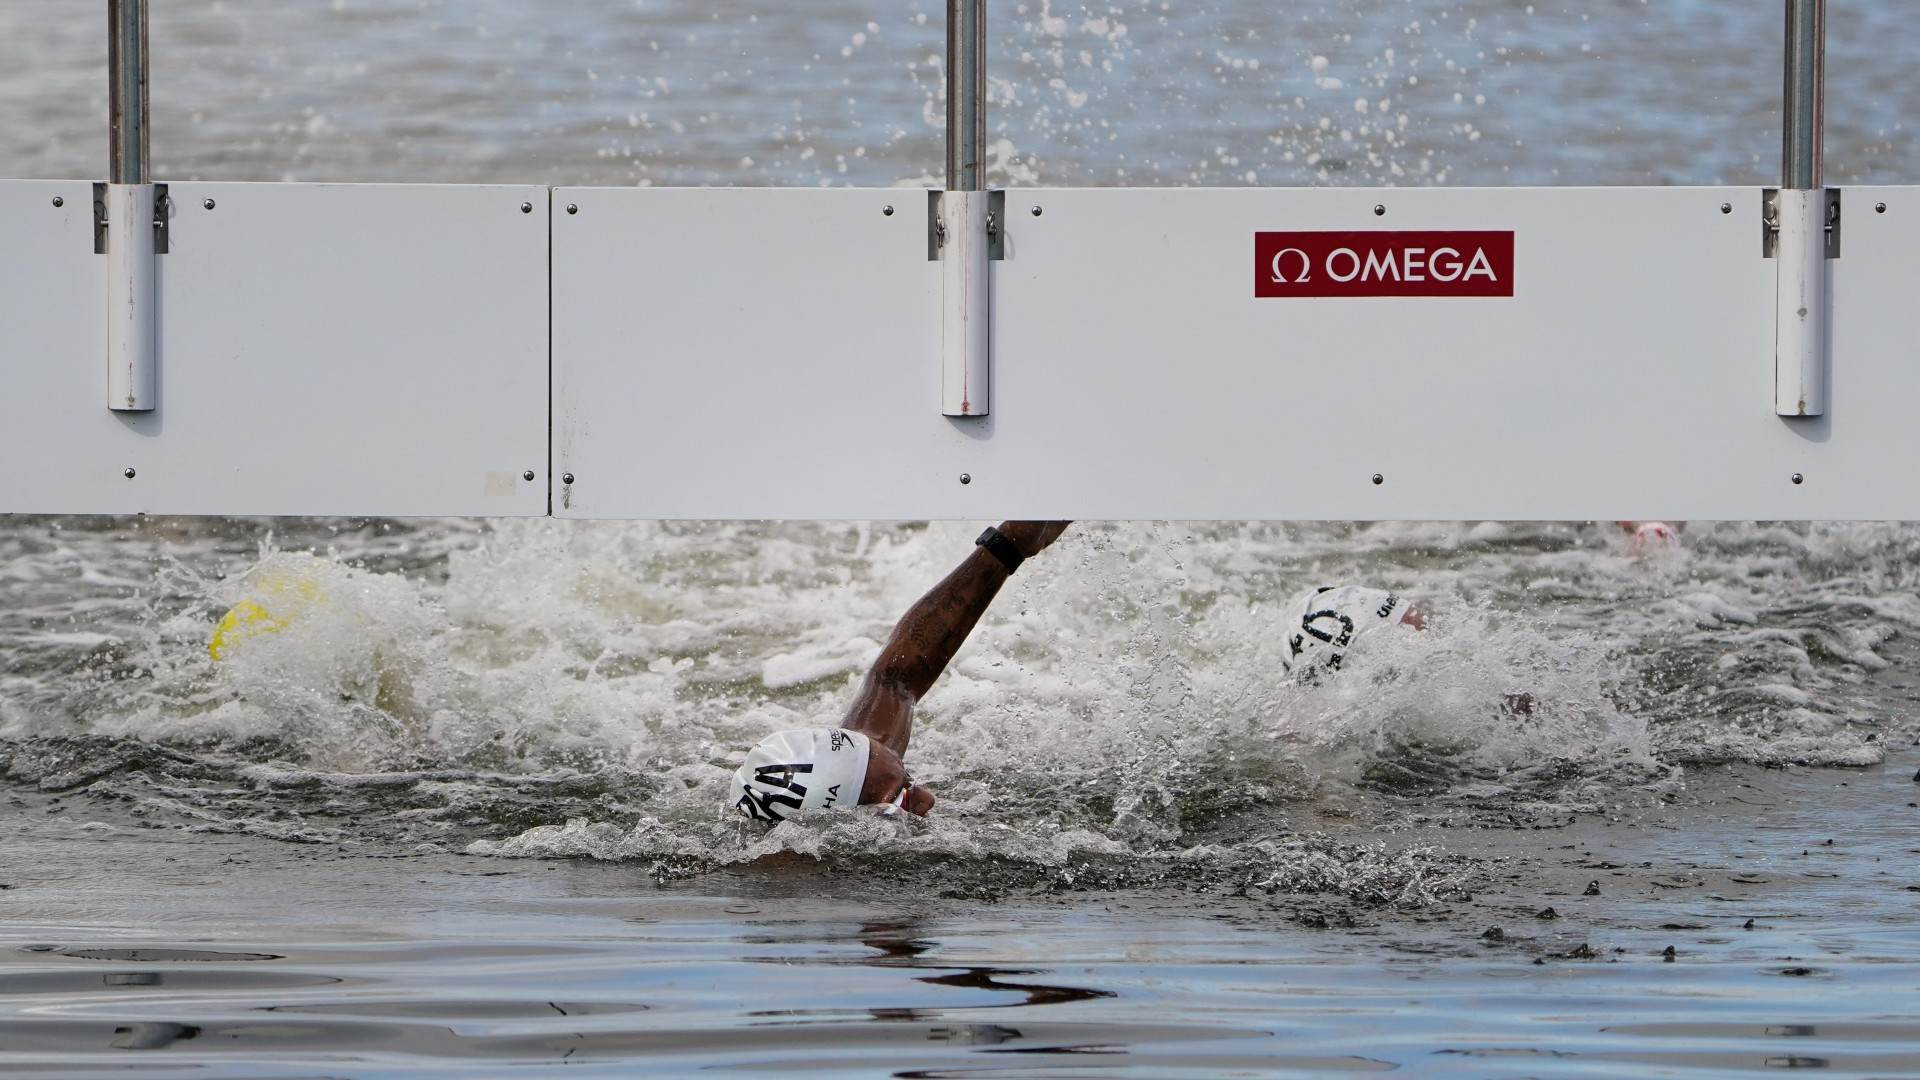 Ana Marcela Cunha, campeã da maratona aquática nas Olimpíadas